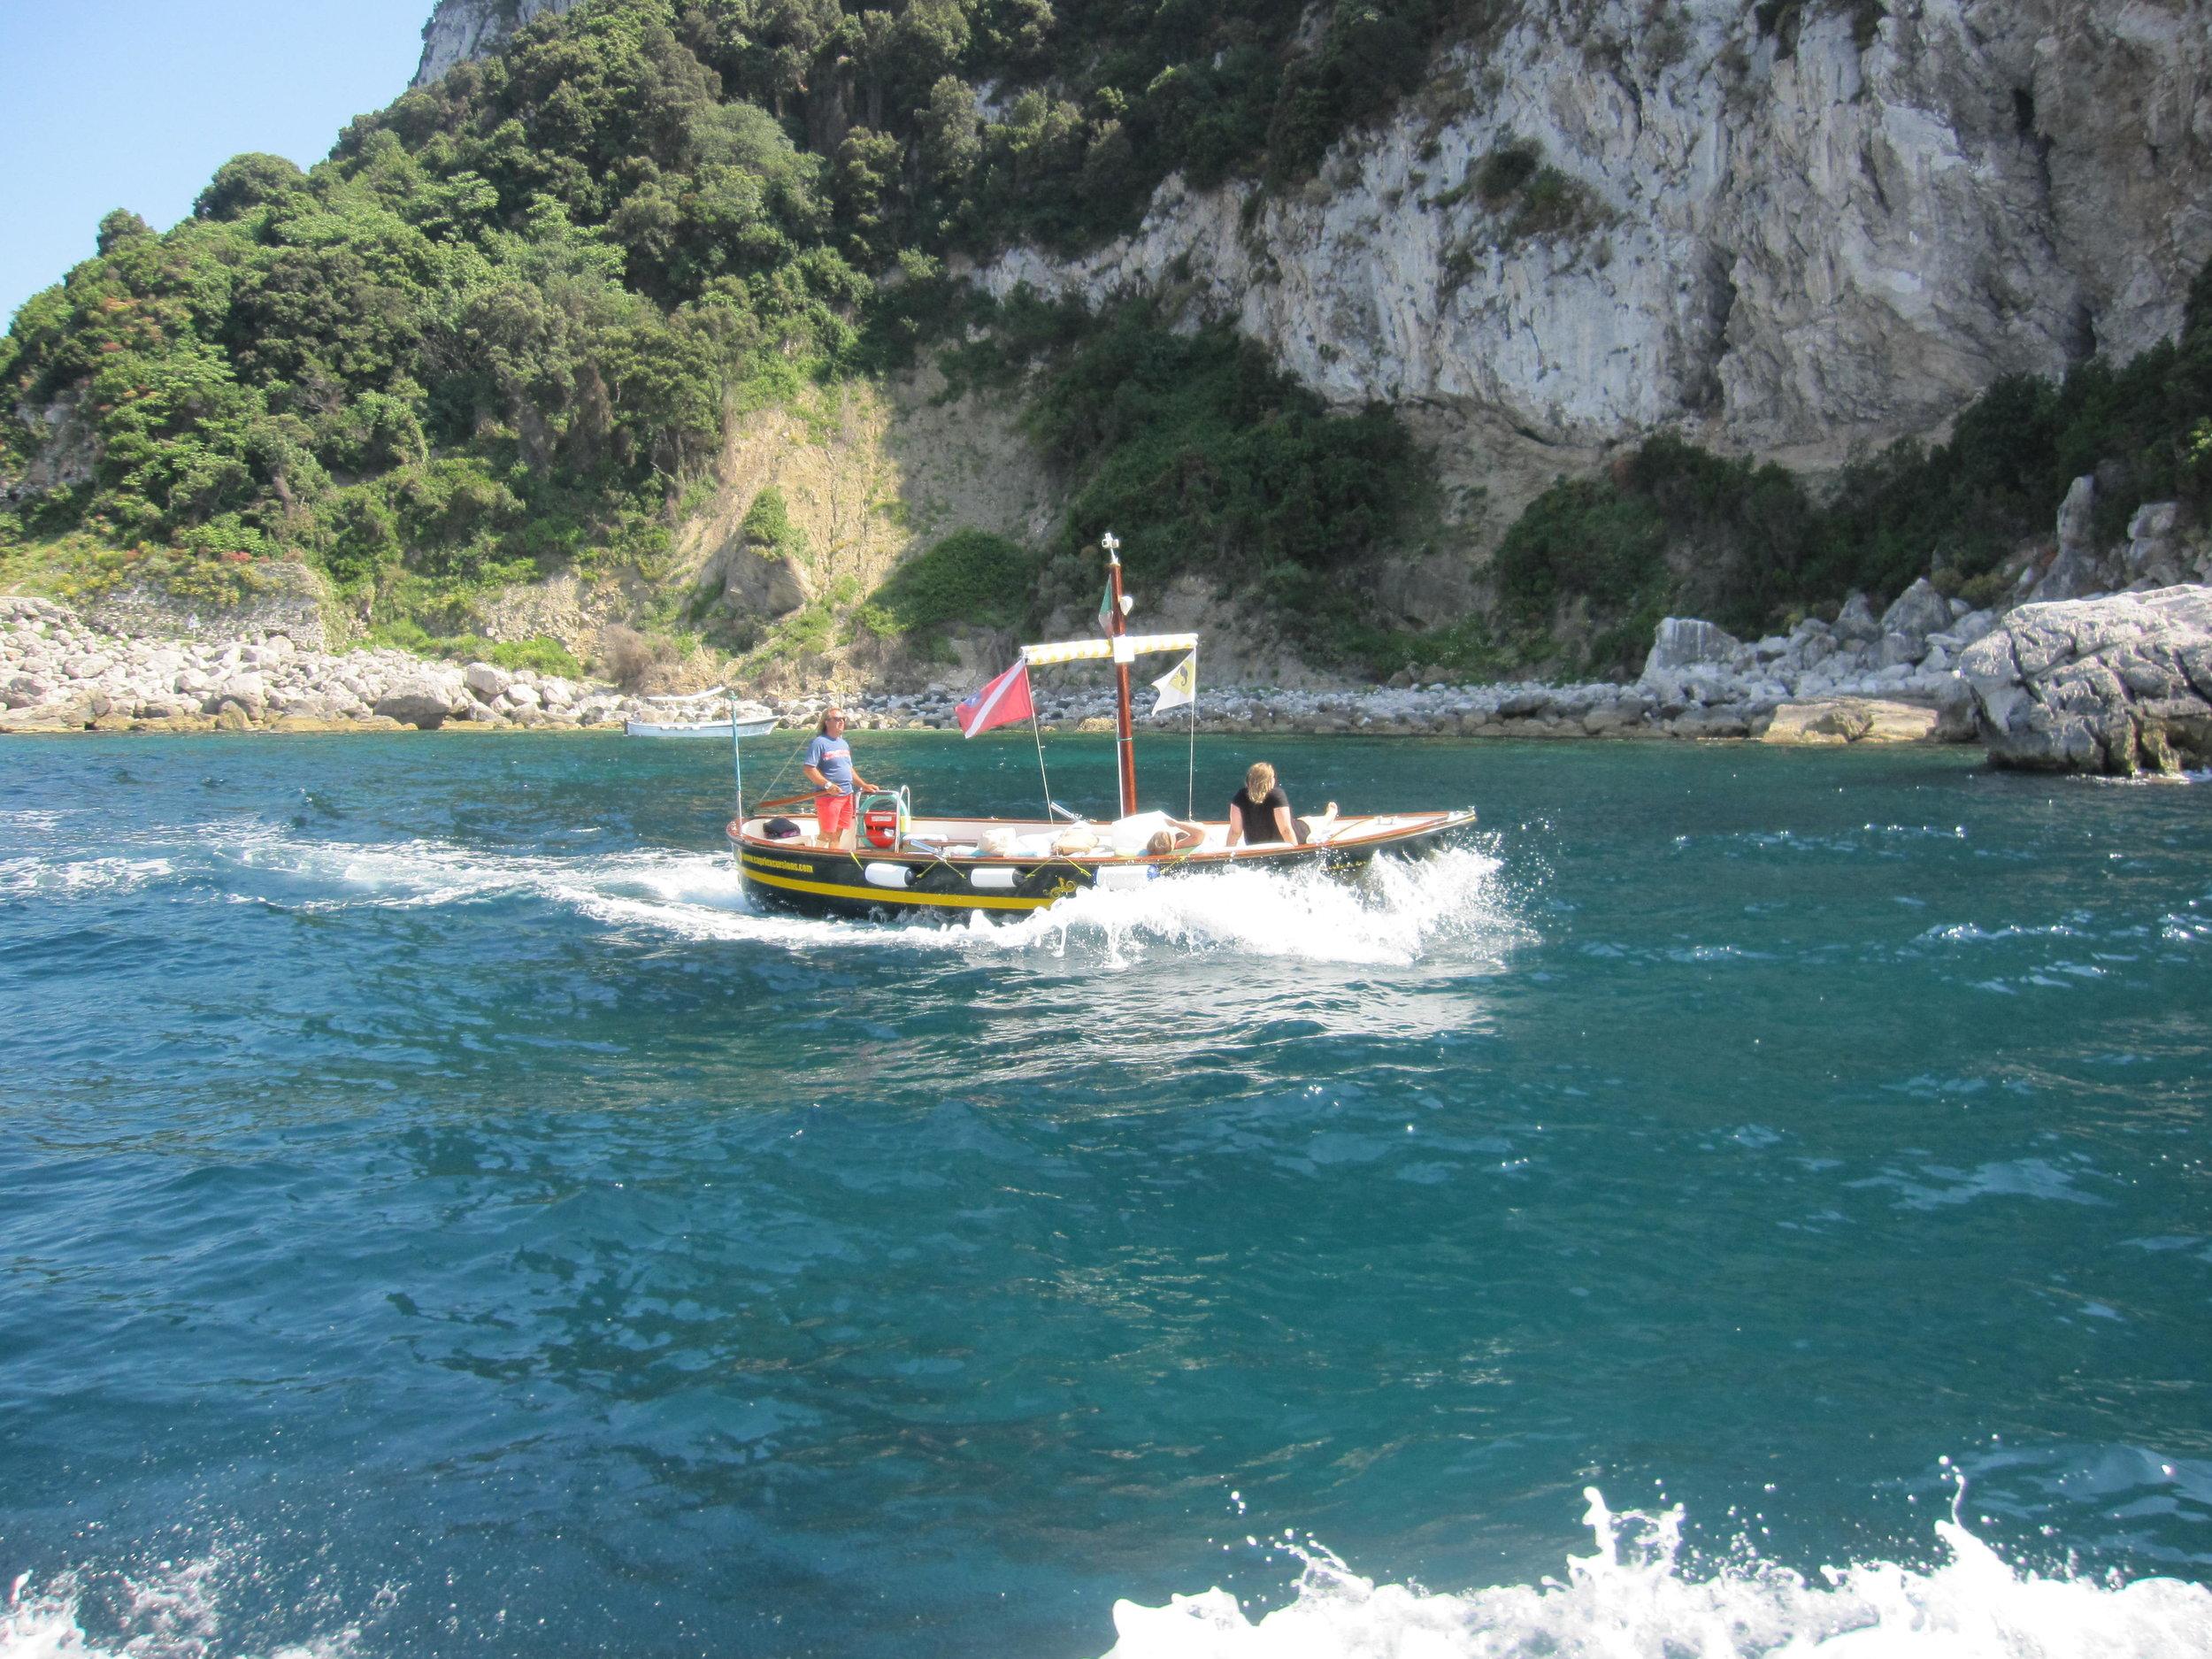 Another way to get around Capri.